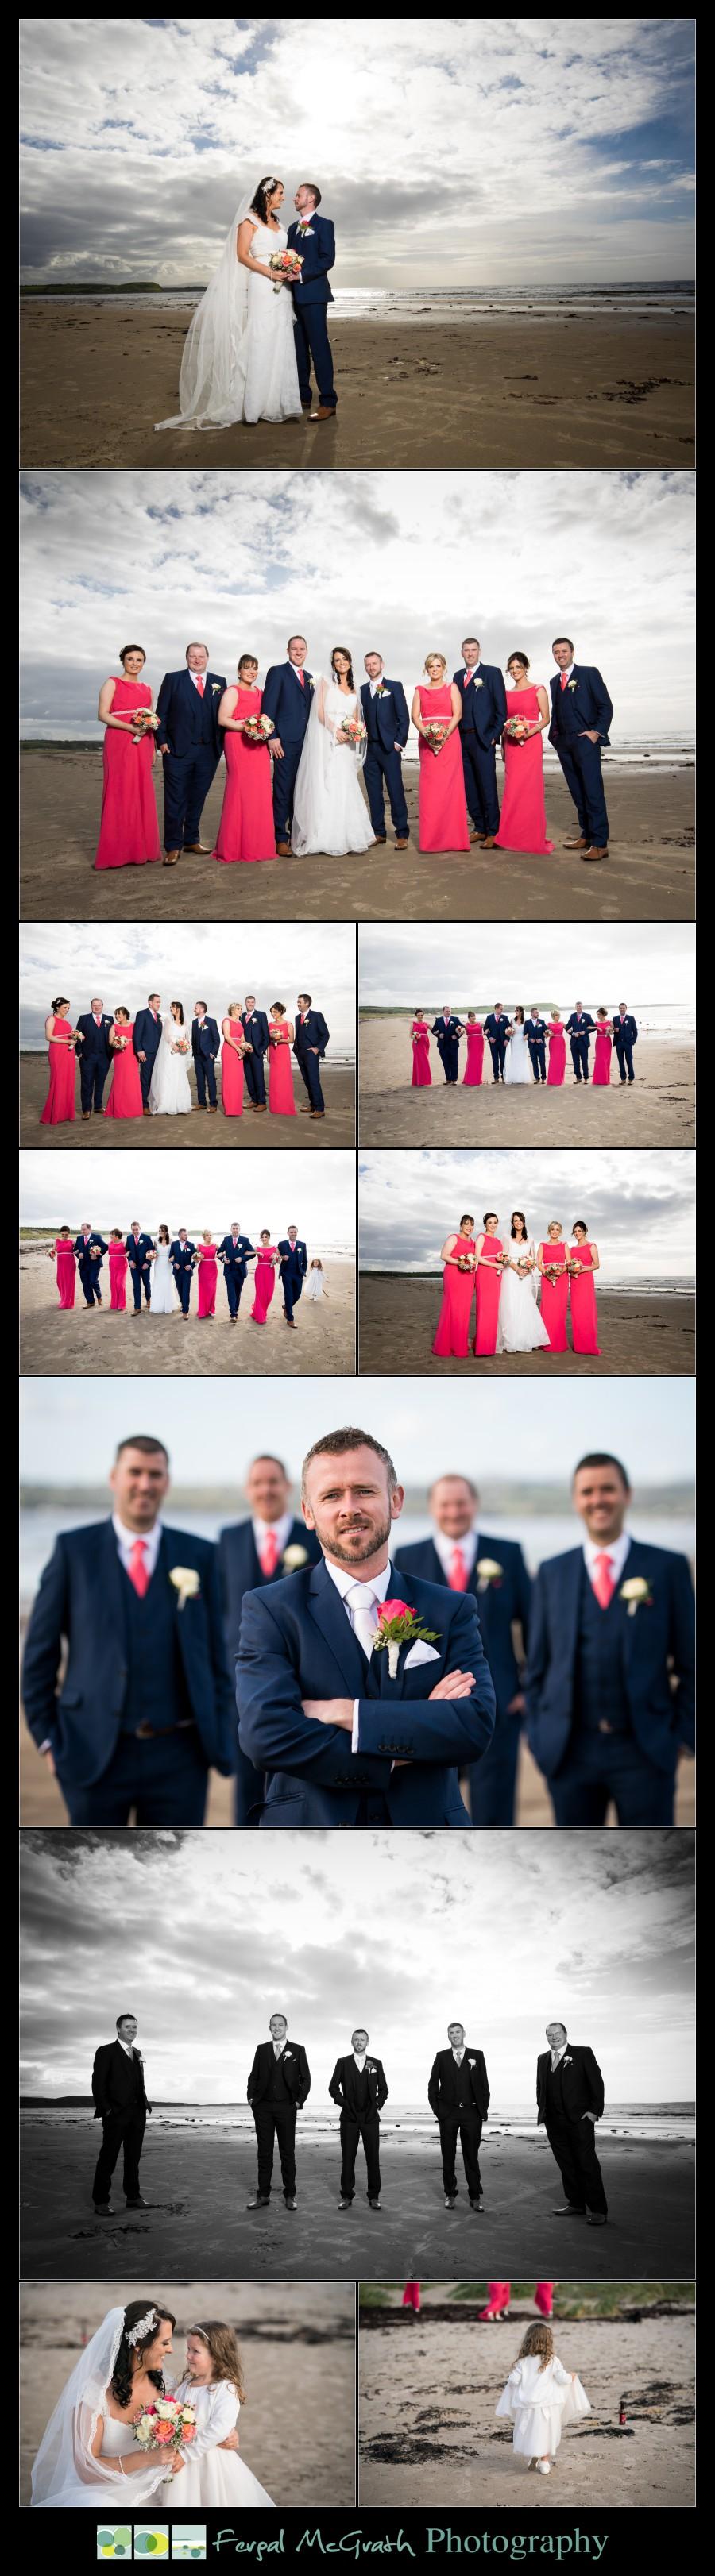 Mill Park Hotel Wedding Laura + John bridal party photos on murvagh beach